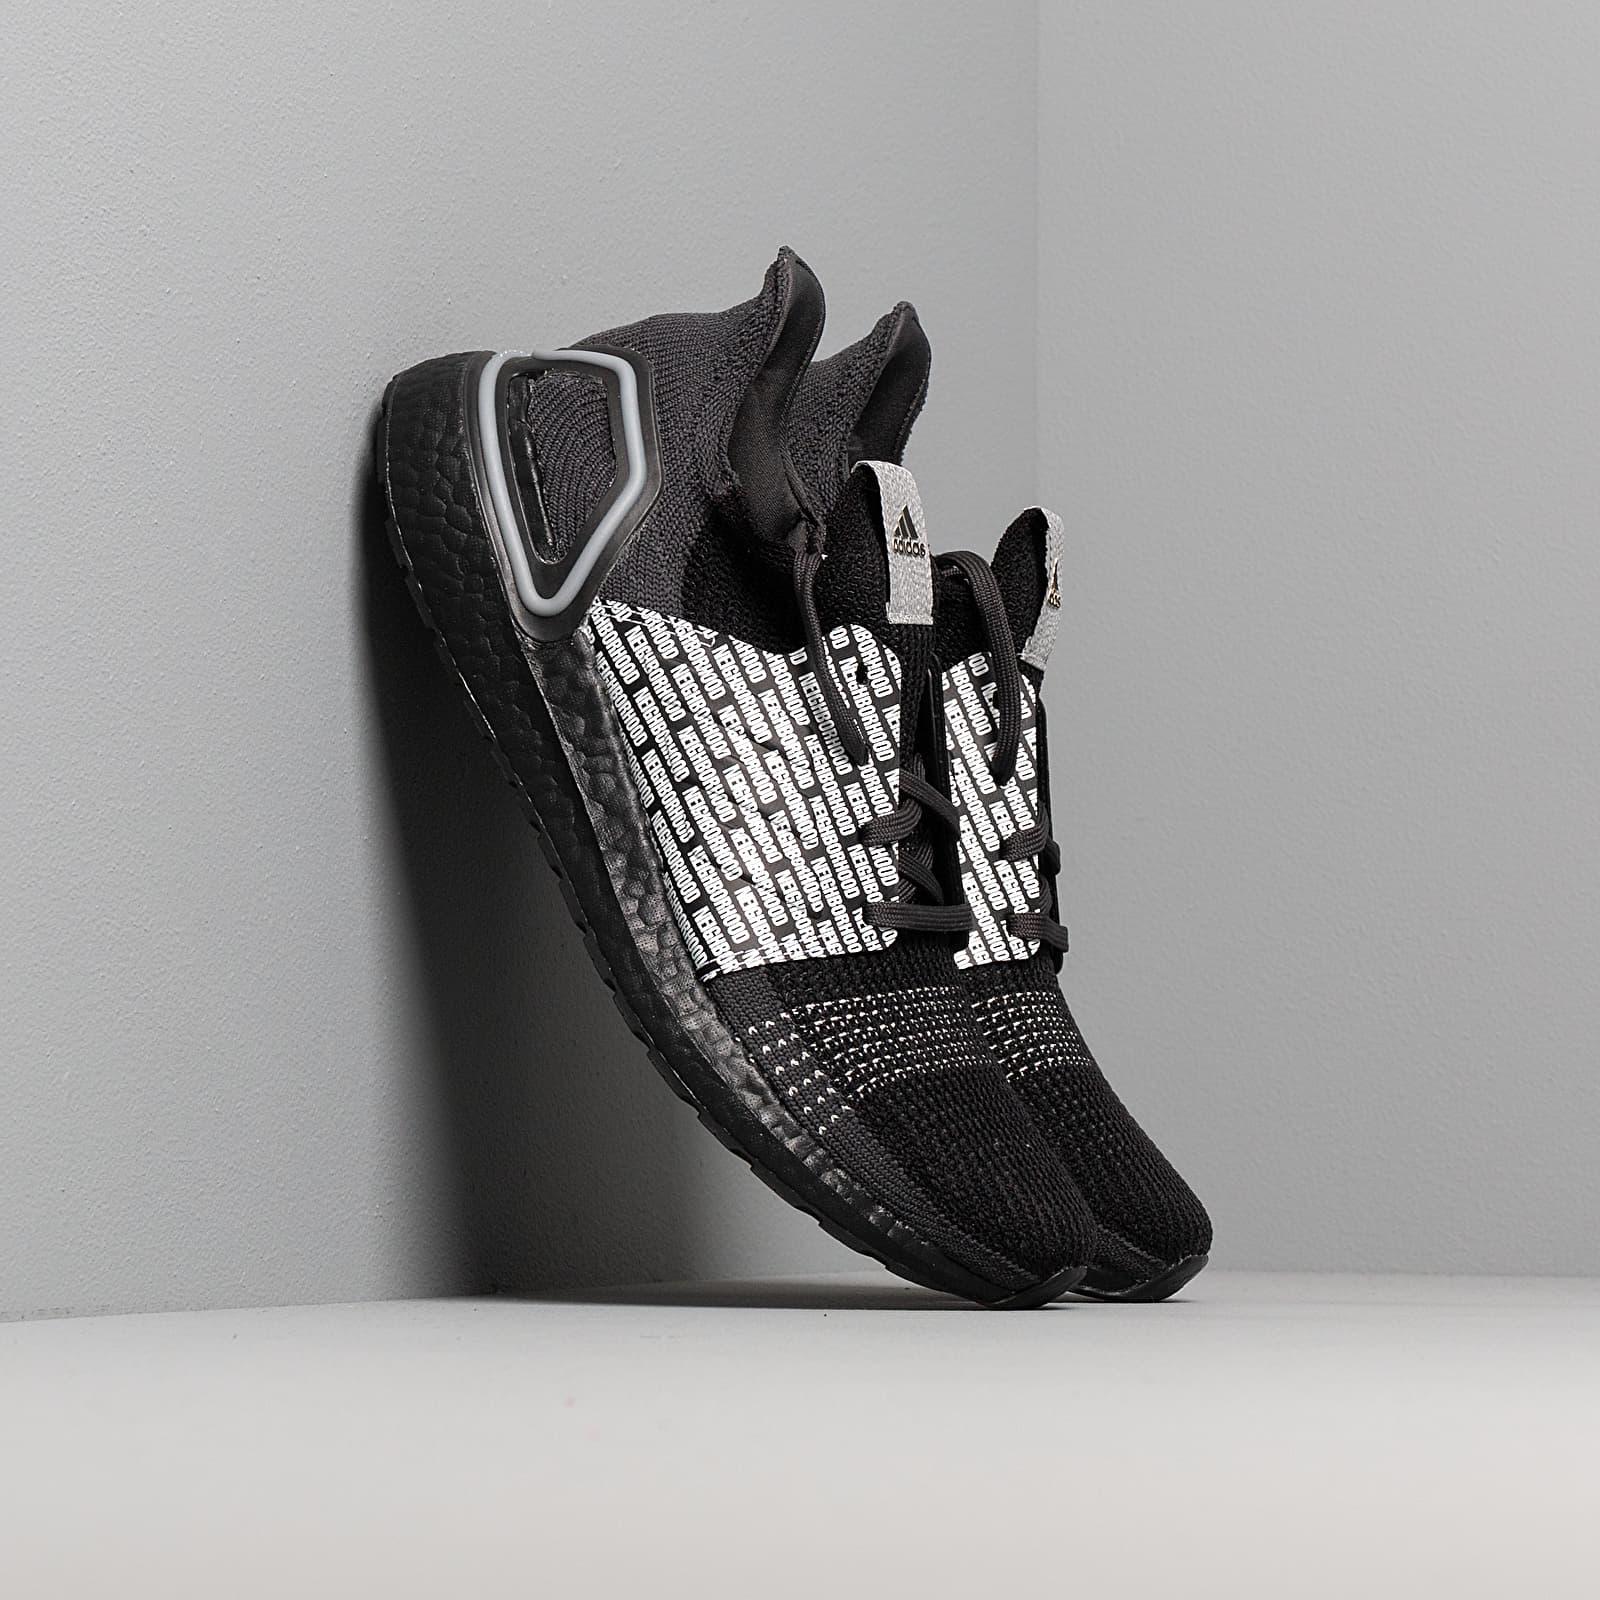 Men's shoes adidas x Neighborhood UltraBOOST 19 Core Black/ Core Black/ Ftwr White